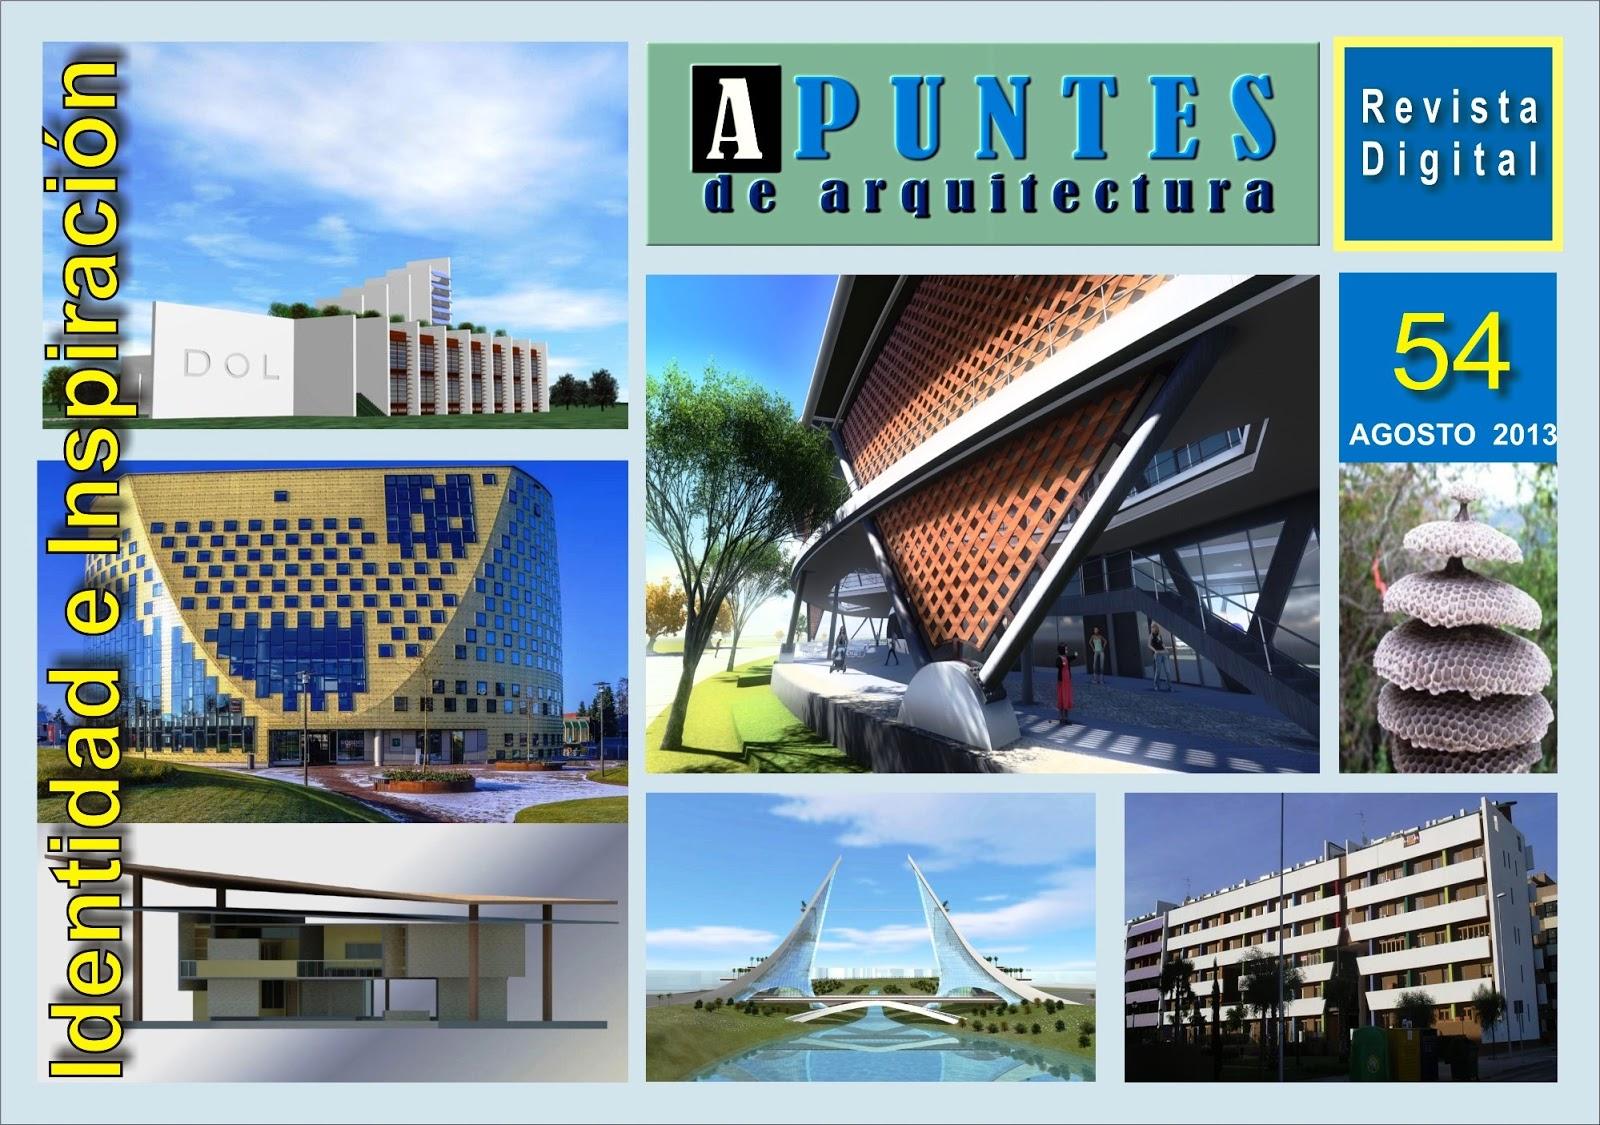 Apuntes revista digital de arquitectura revista digital for Revistas arquitectura espana